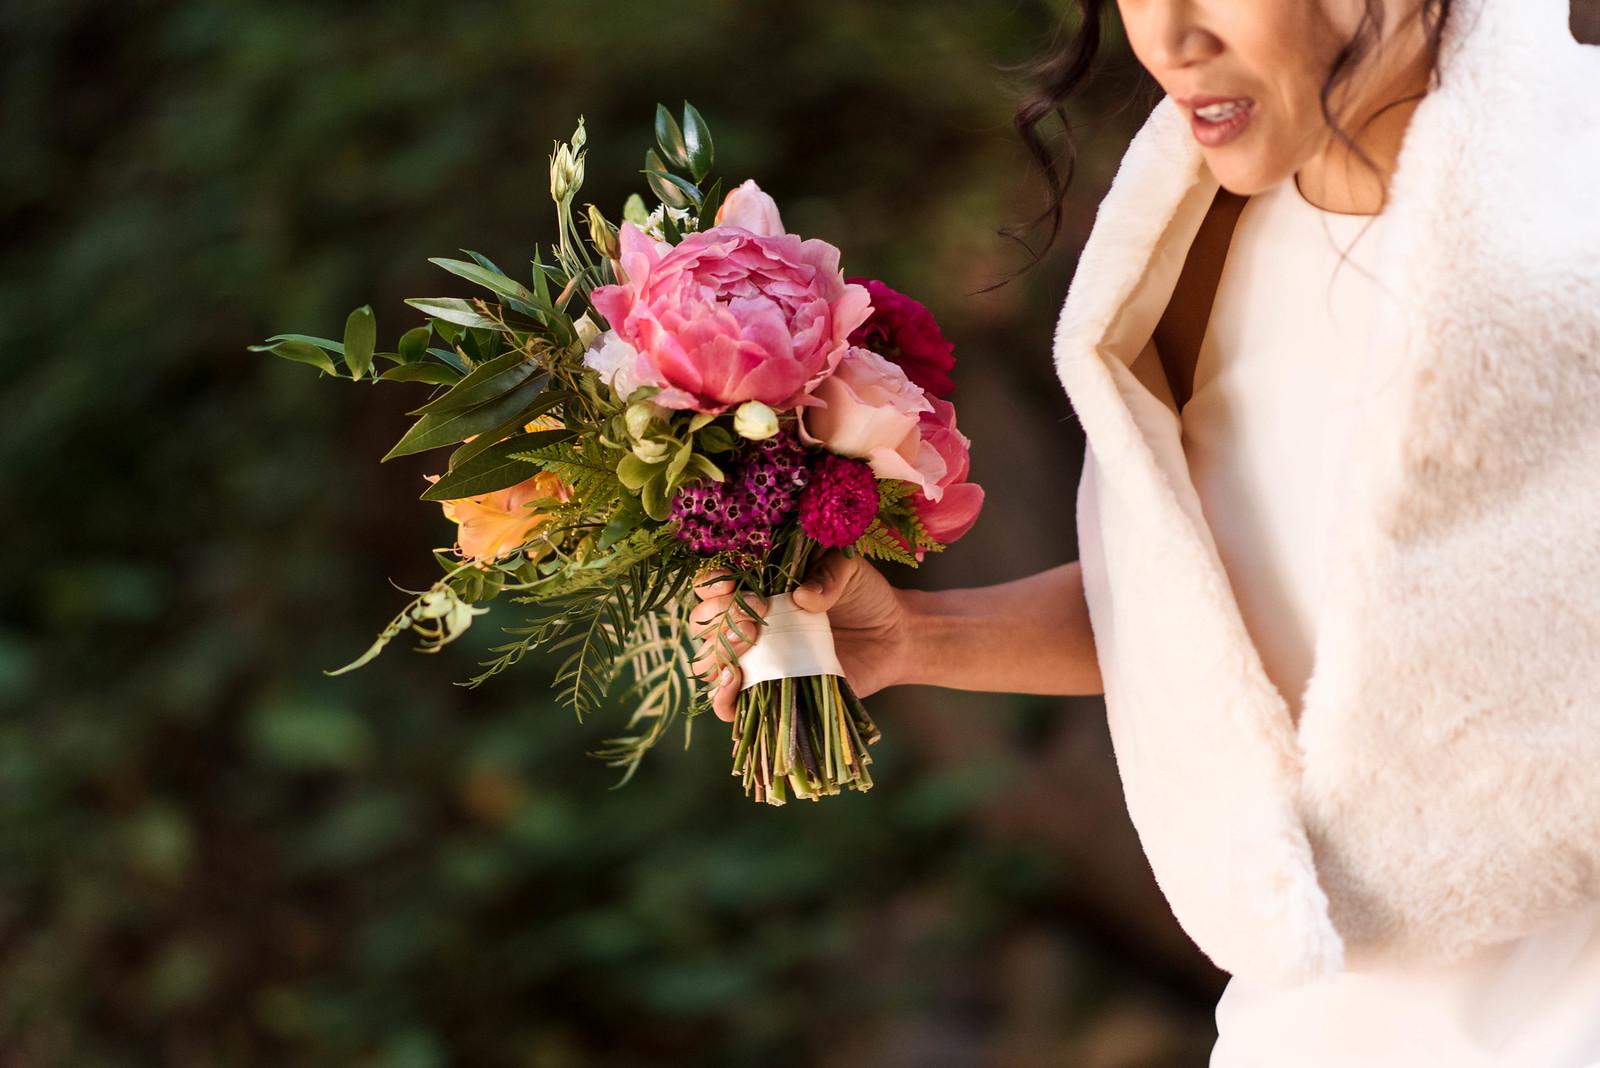 Faux Fur Shrug Wedding Chilly Autumn Fall Wedding Photography Wedding Inspo